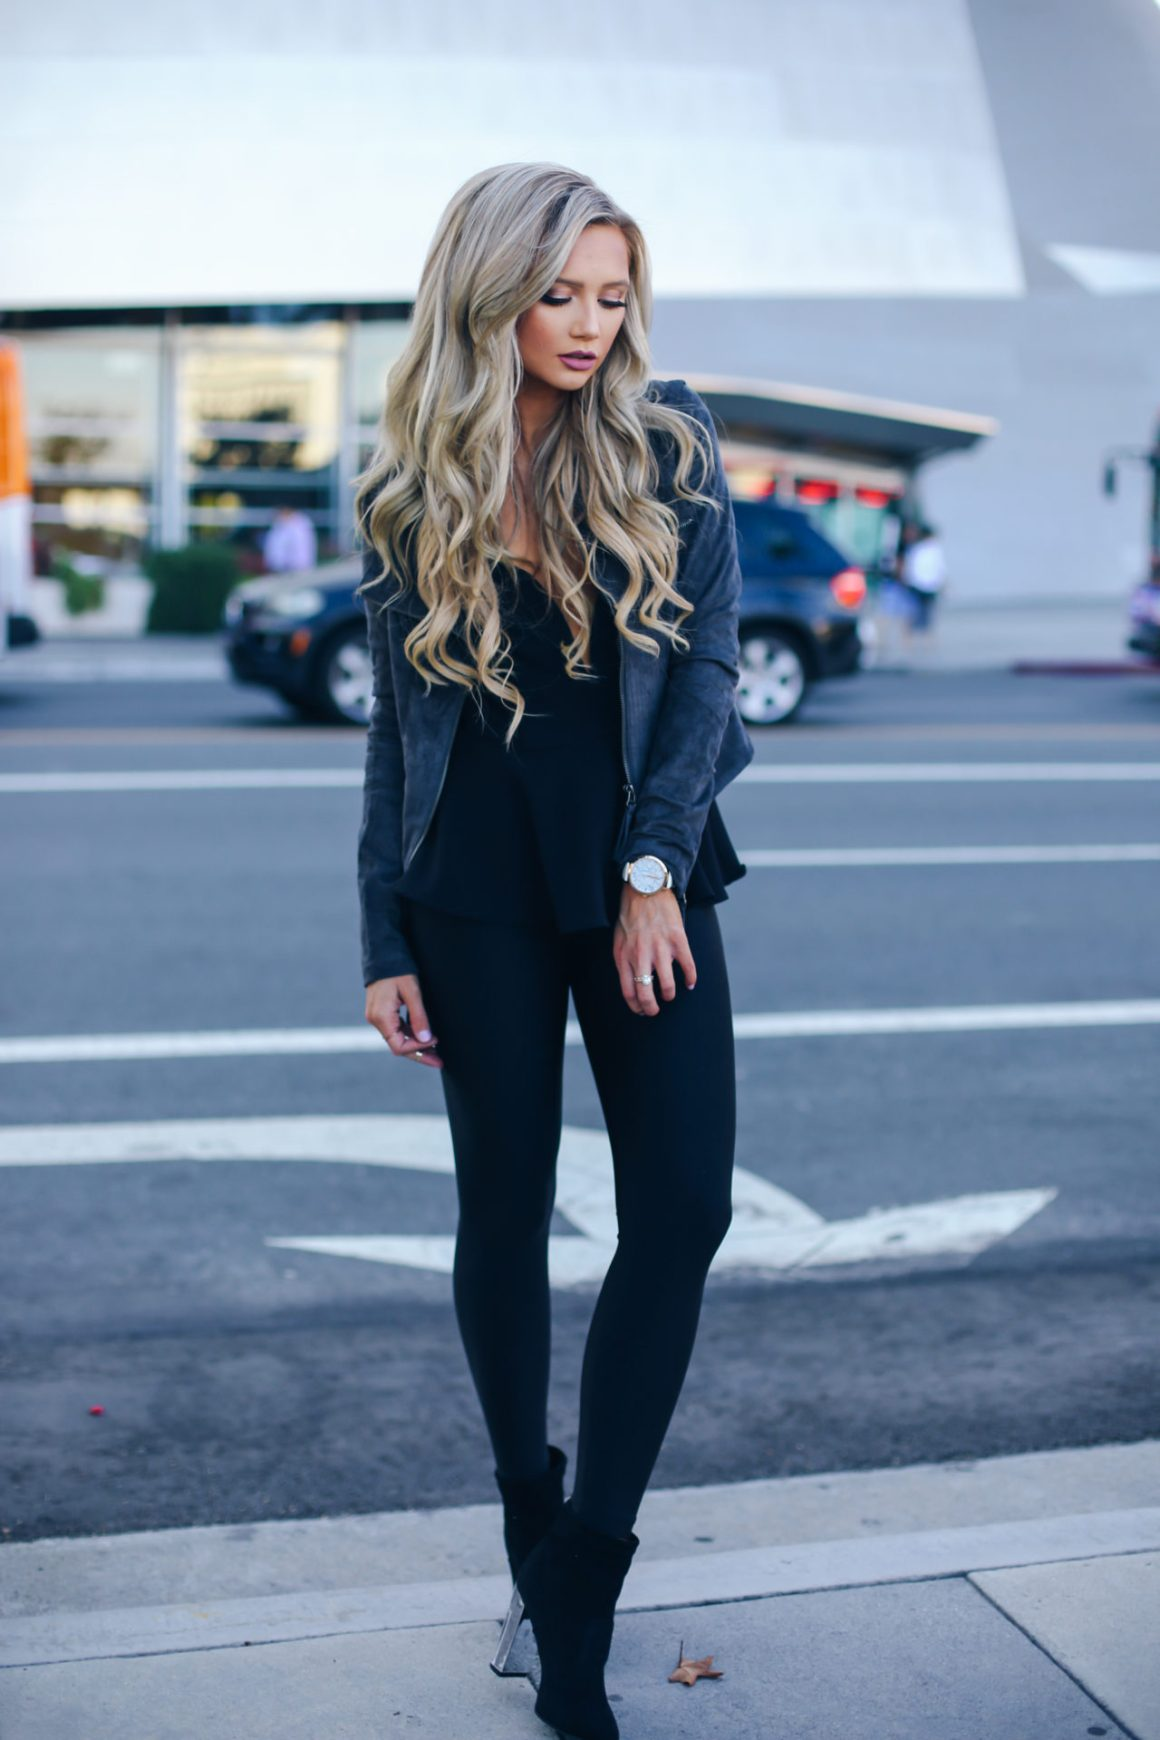 Black-Peplum-leggings-stephanie-danielle-thecityblonde-ryanbyryanchua-4521